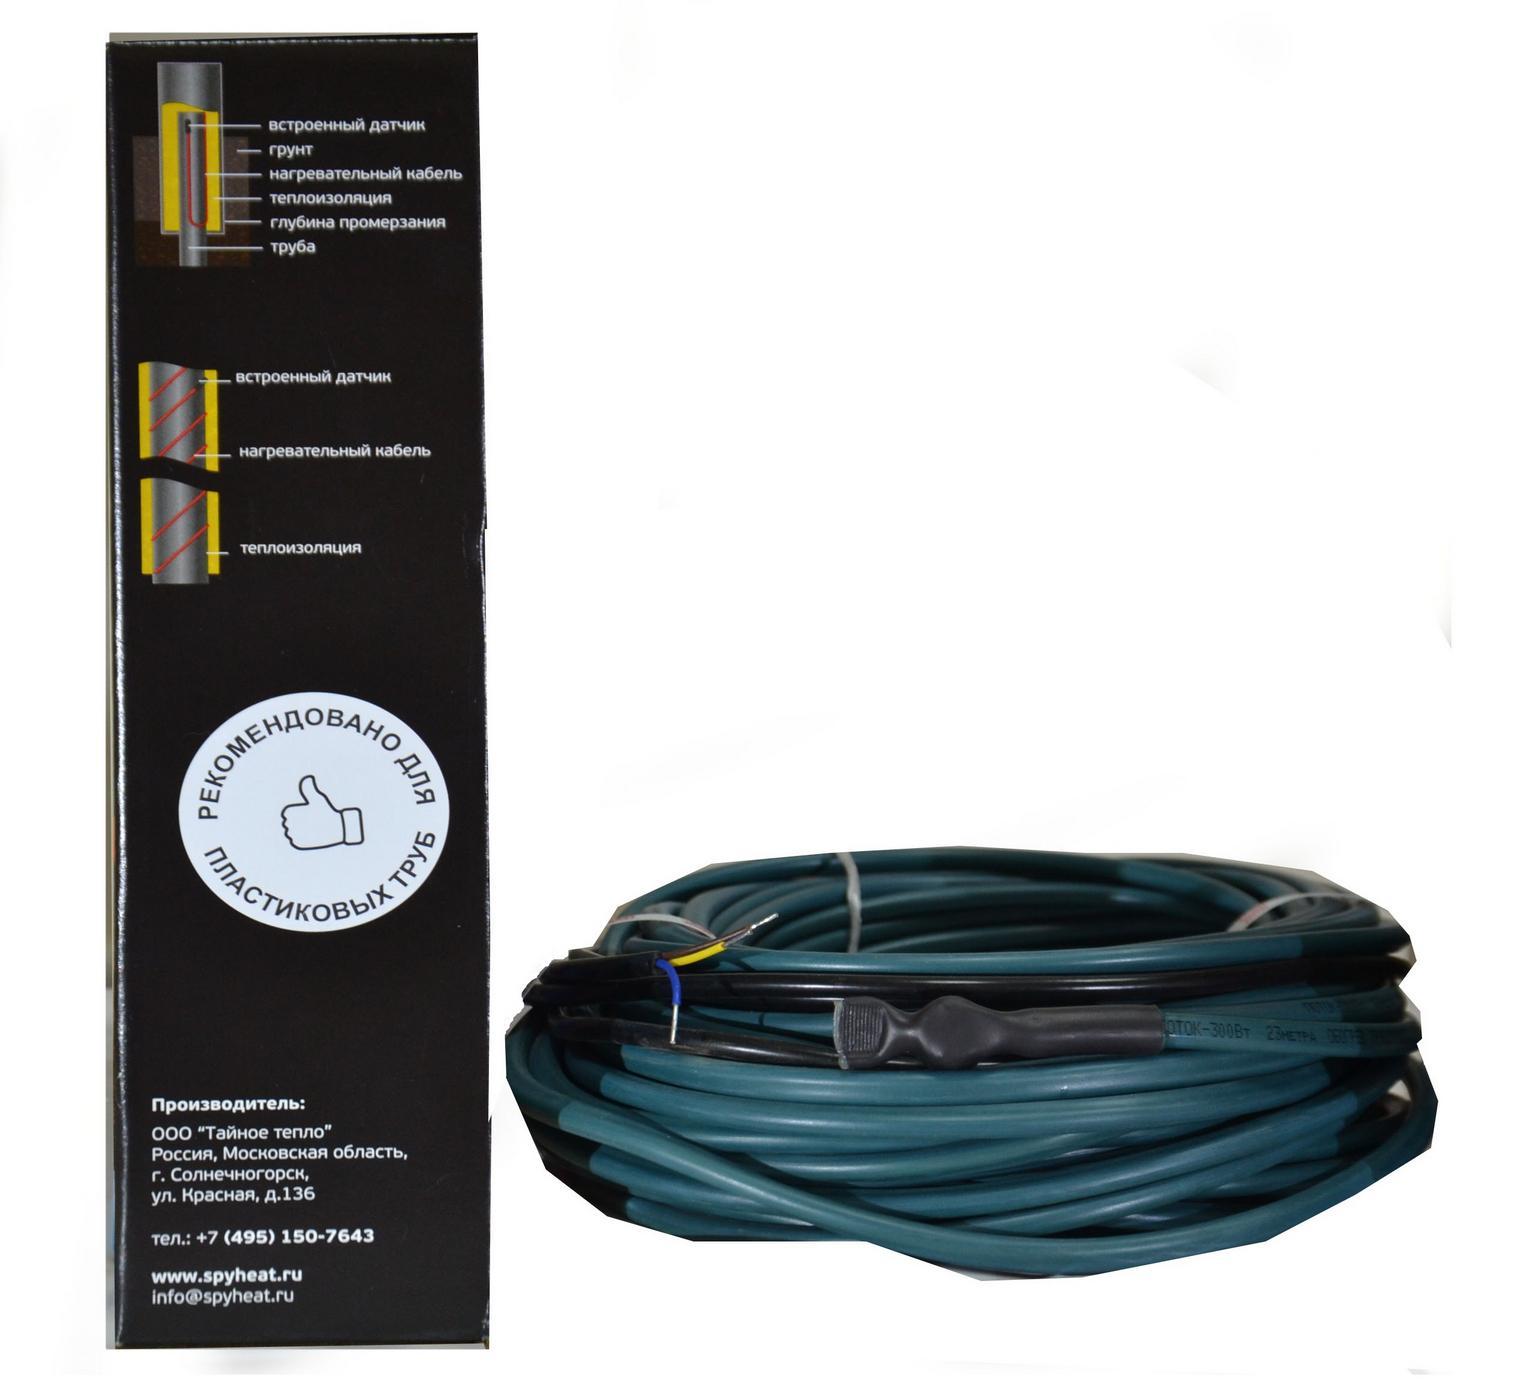 Греющий кабель Spyheat ПОТОК shfd-13-100